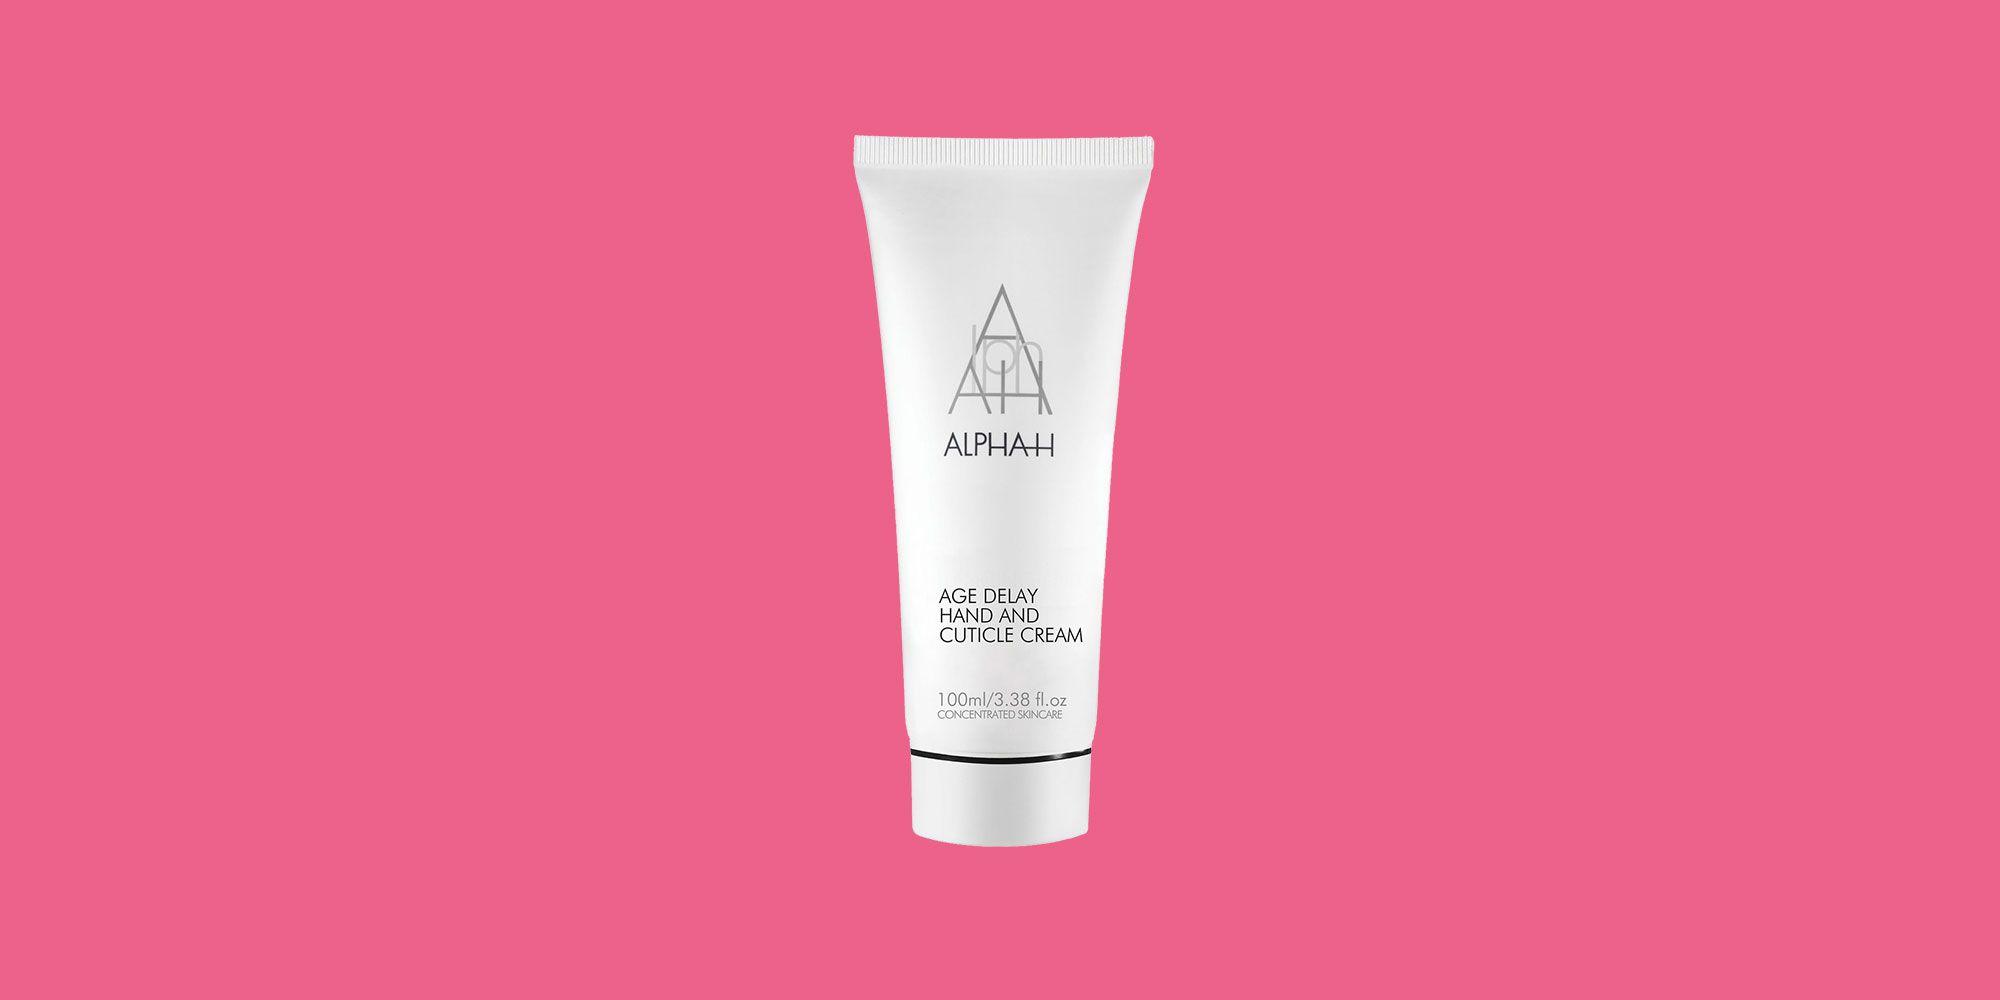 Alpha H Age Delay Hand and Cuticle Cream